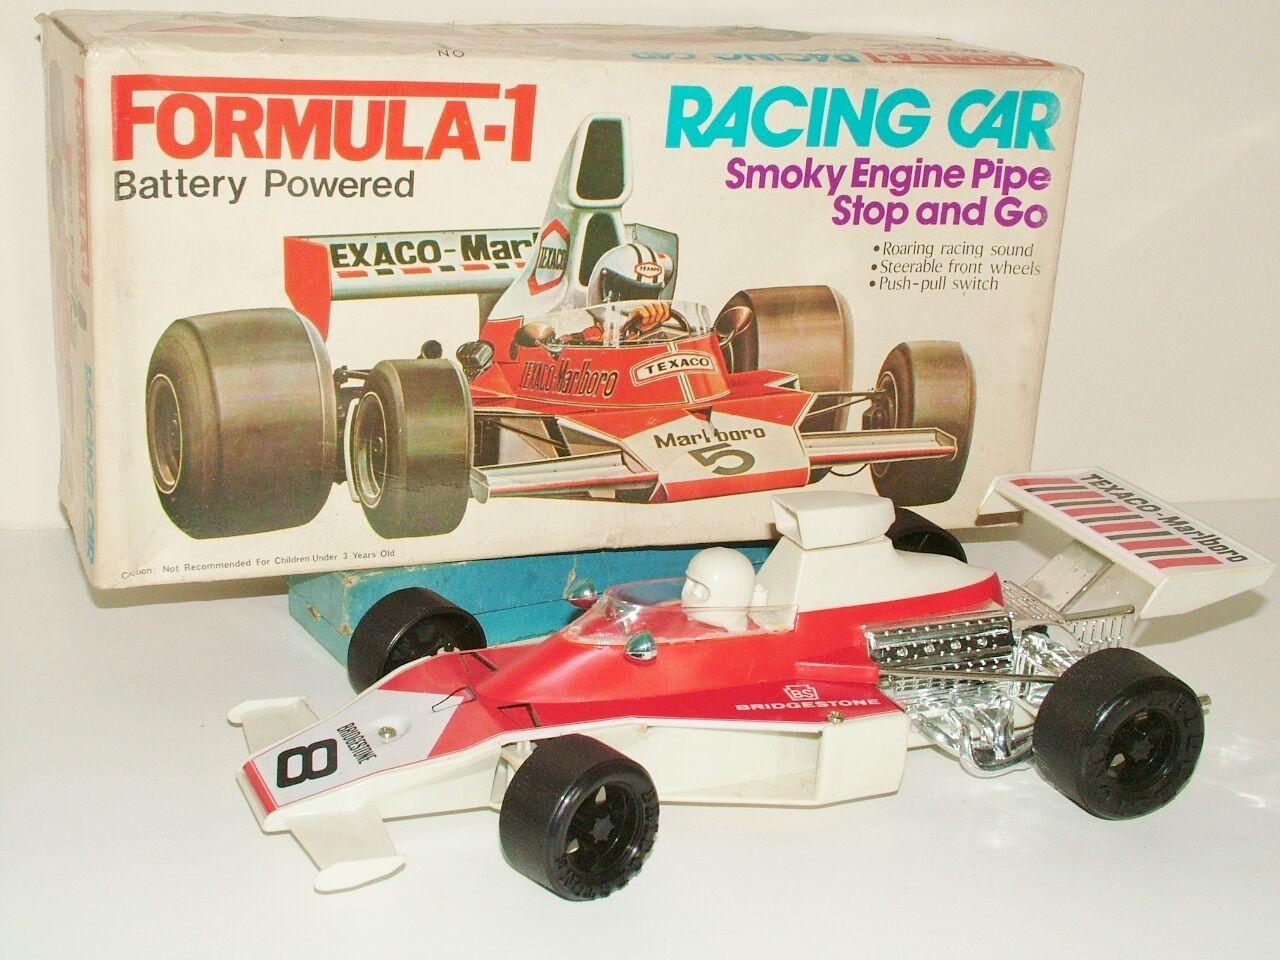 Hong Kong 8163 8163 8163 Formula 1 Battery Powered Racing Car f5affe